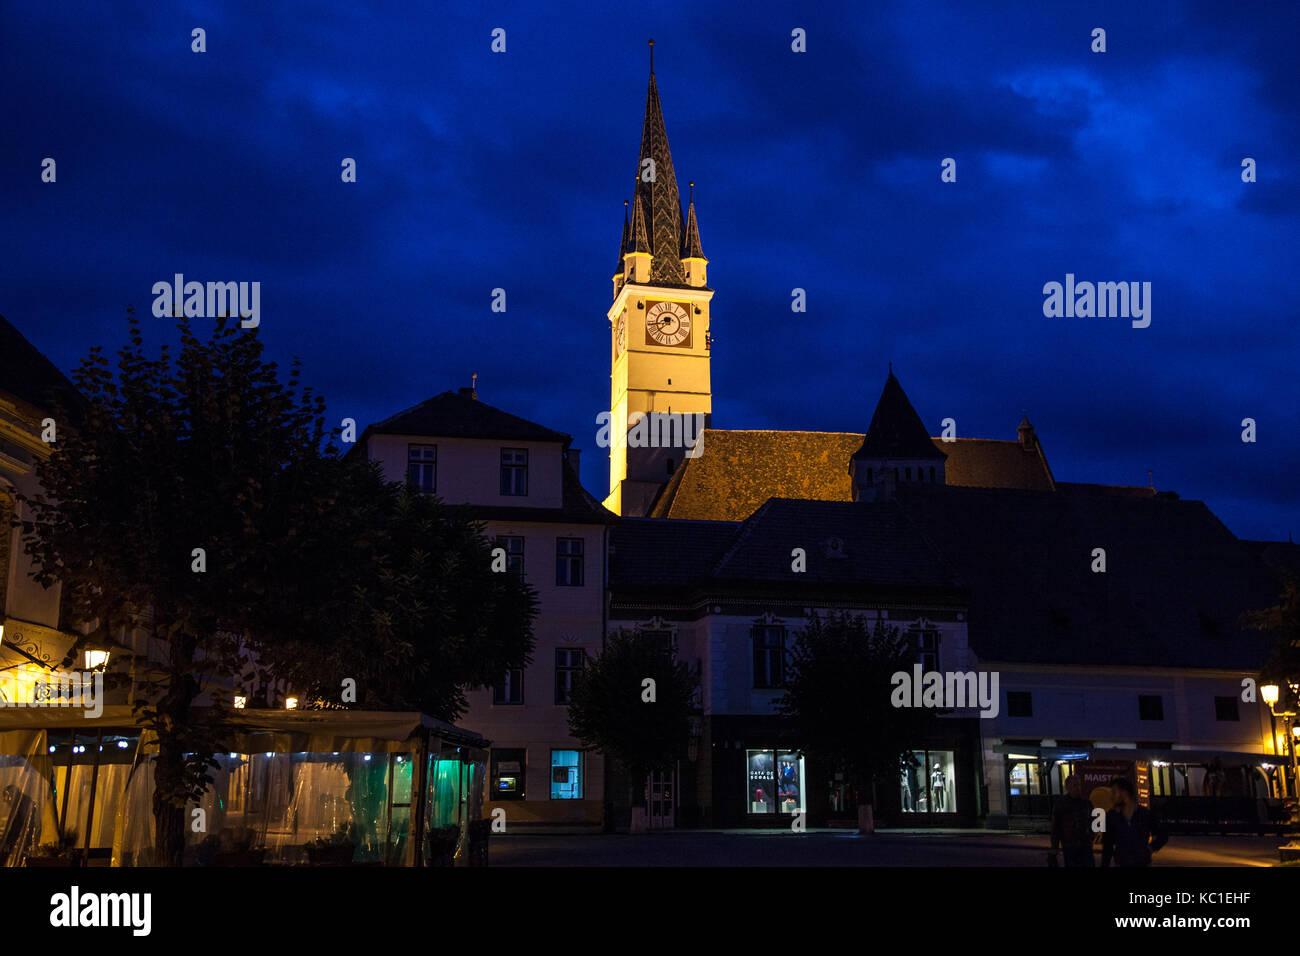 MEDIAS, ROMANIA - SEPTEMBER 22, 2017: Saint Margaret (Sf. Margareta) church in the evening seen from the main square - Stock Image